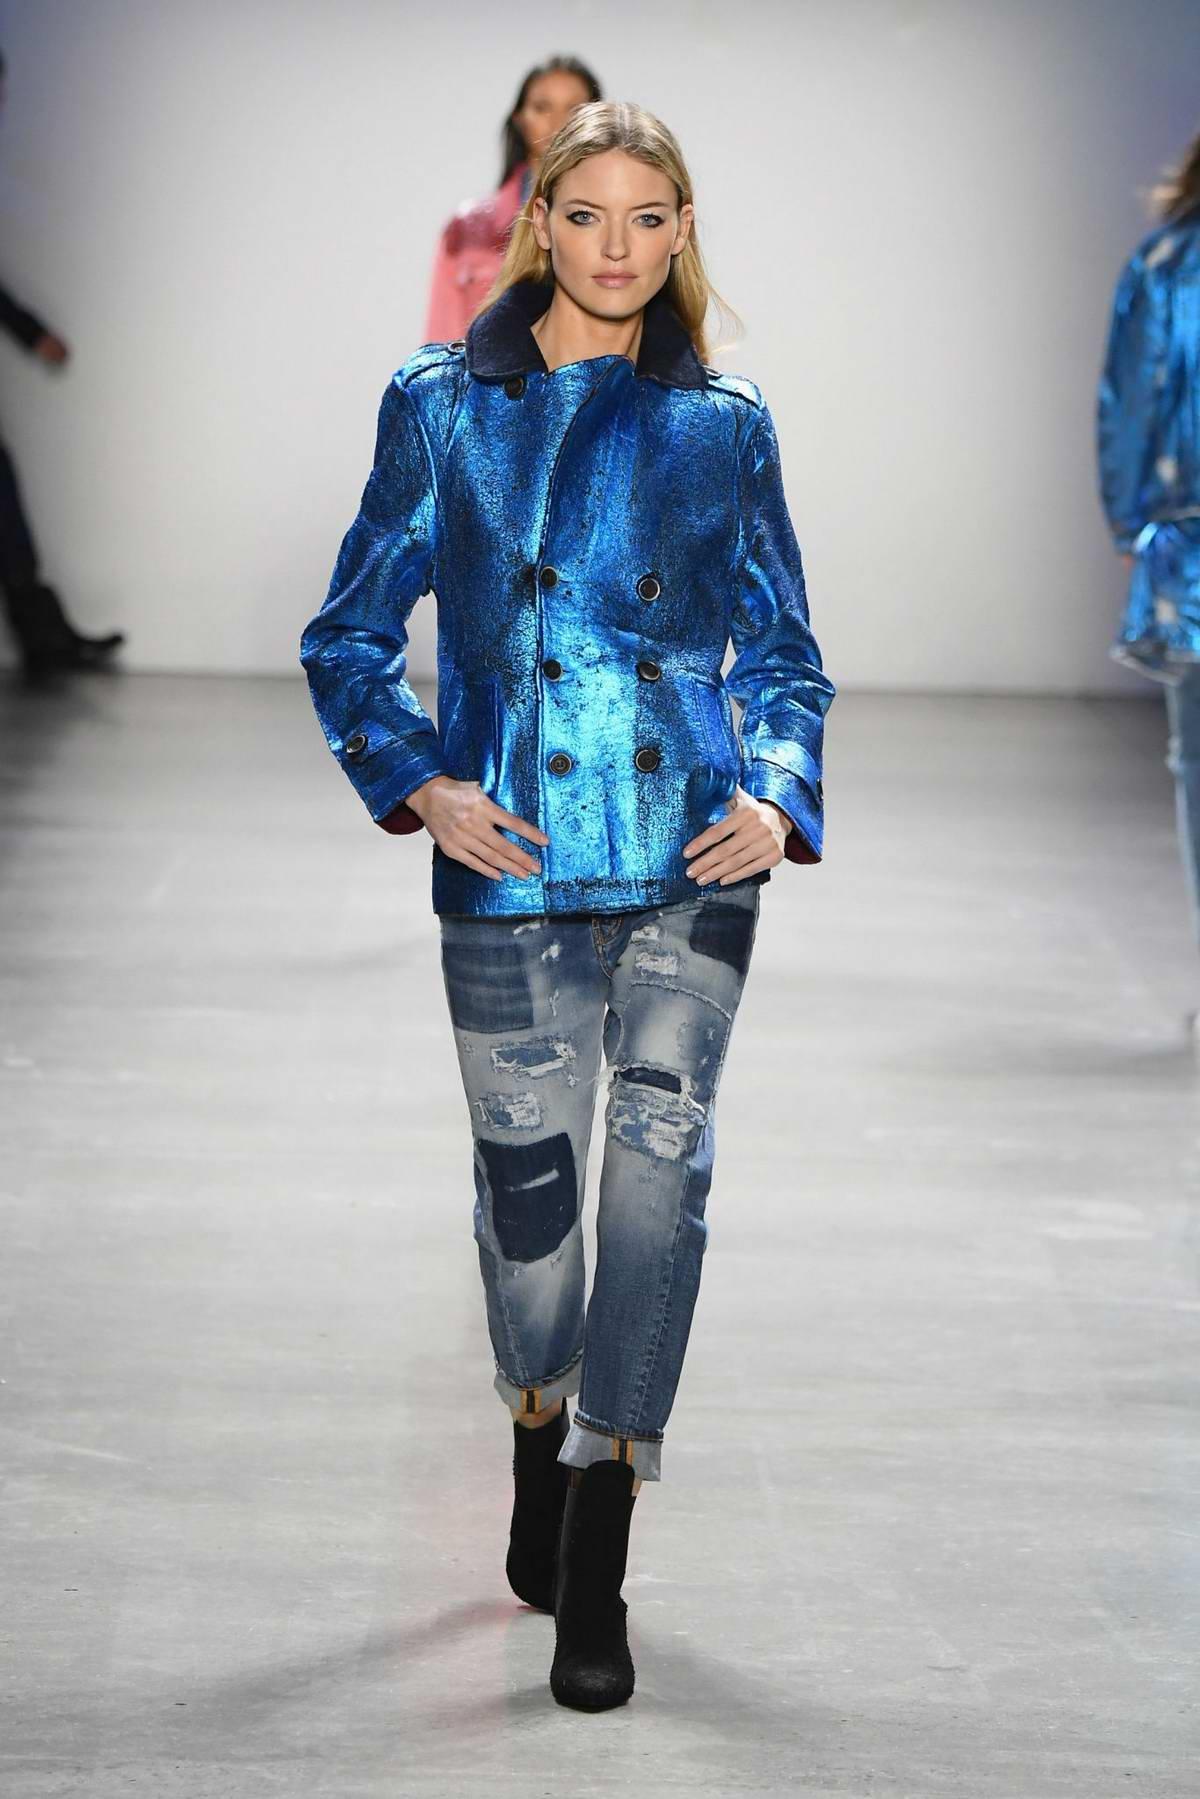 Martha Hunt walks the runway at the John John Fashion Show during New York Fashion Week in New York City